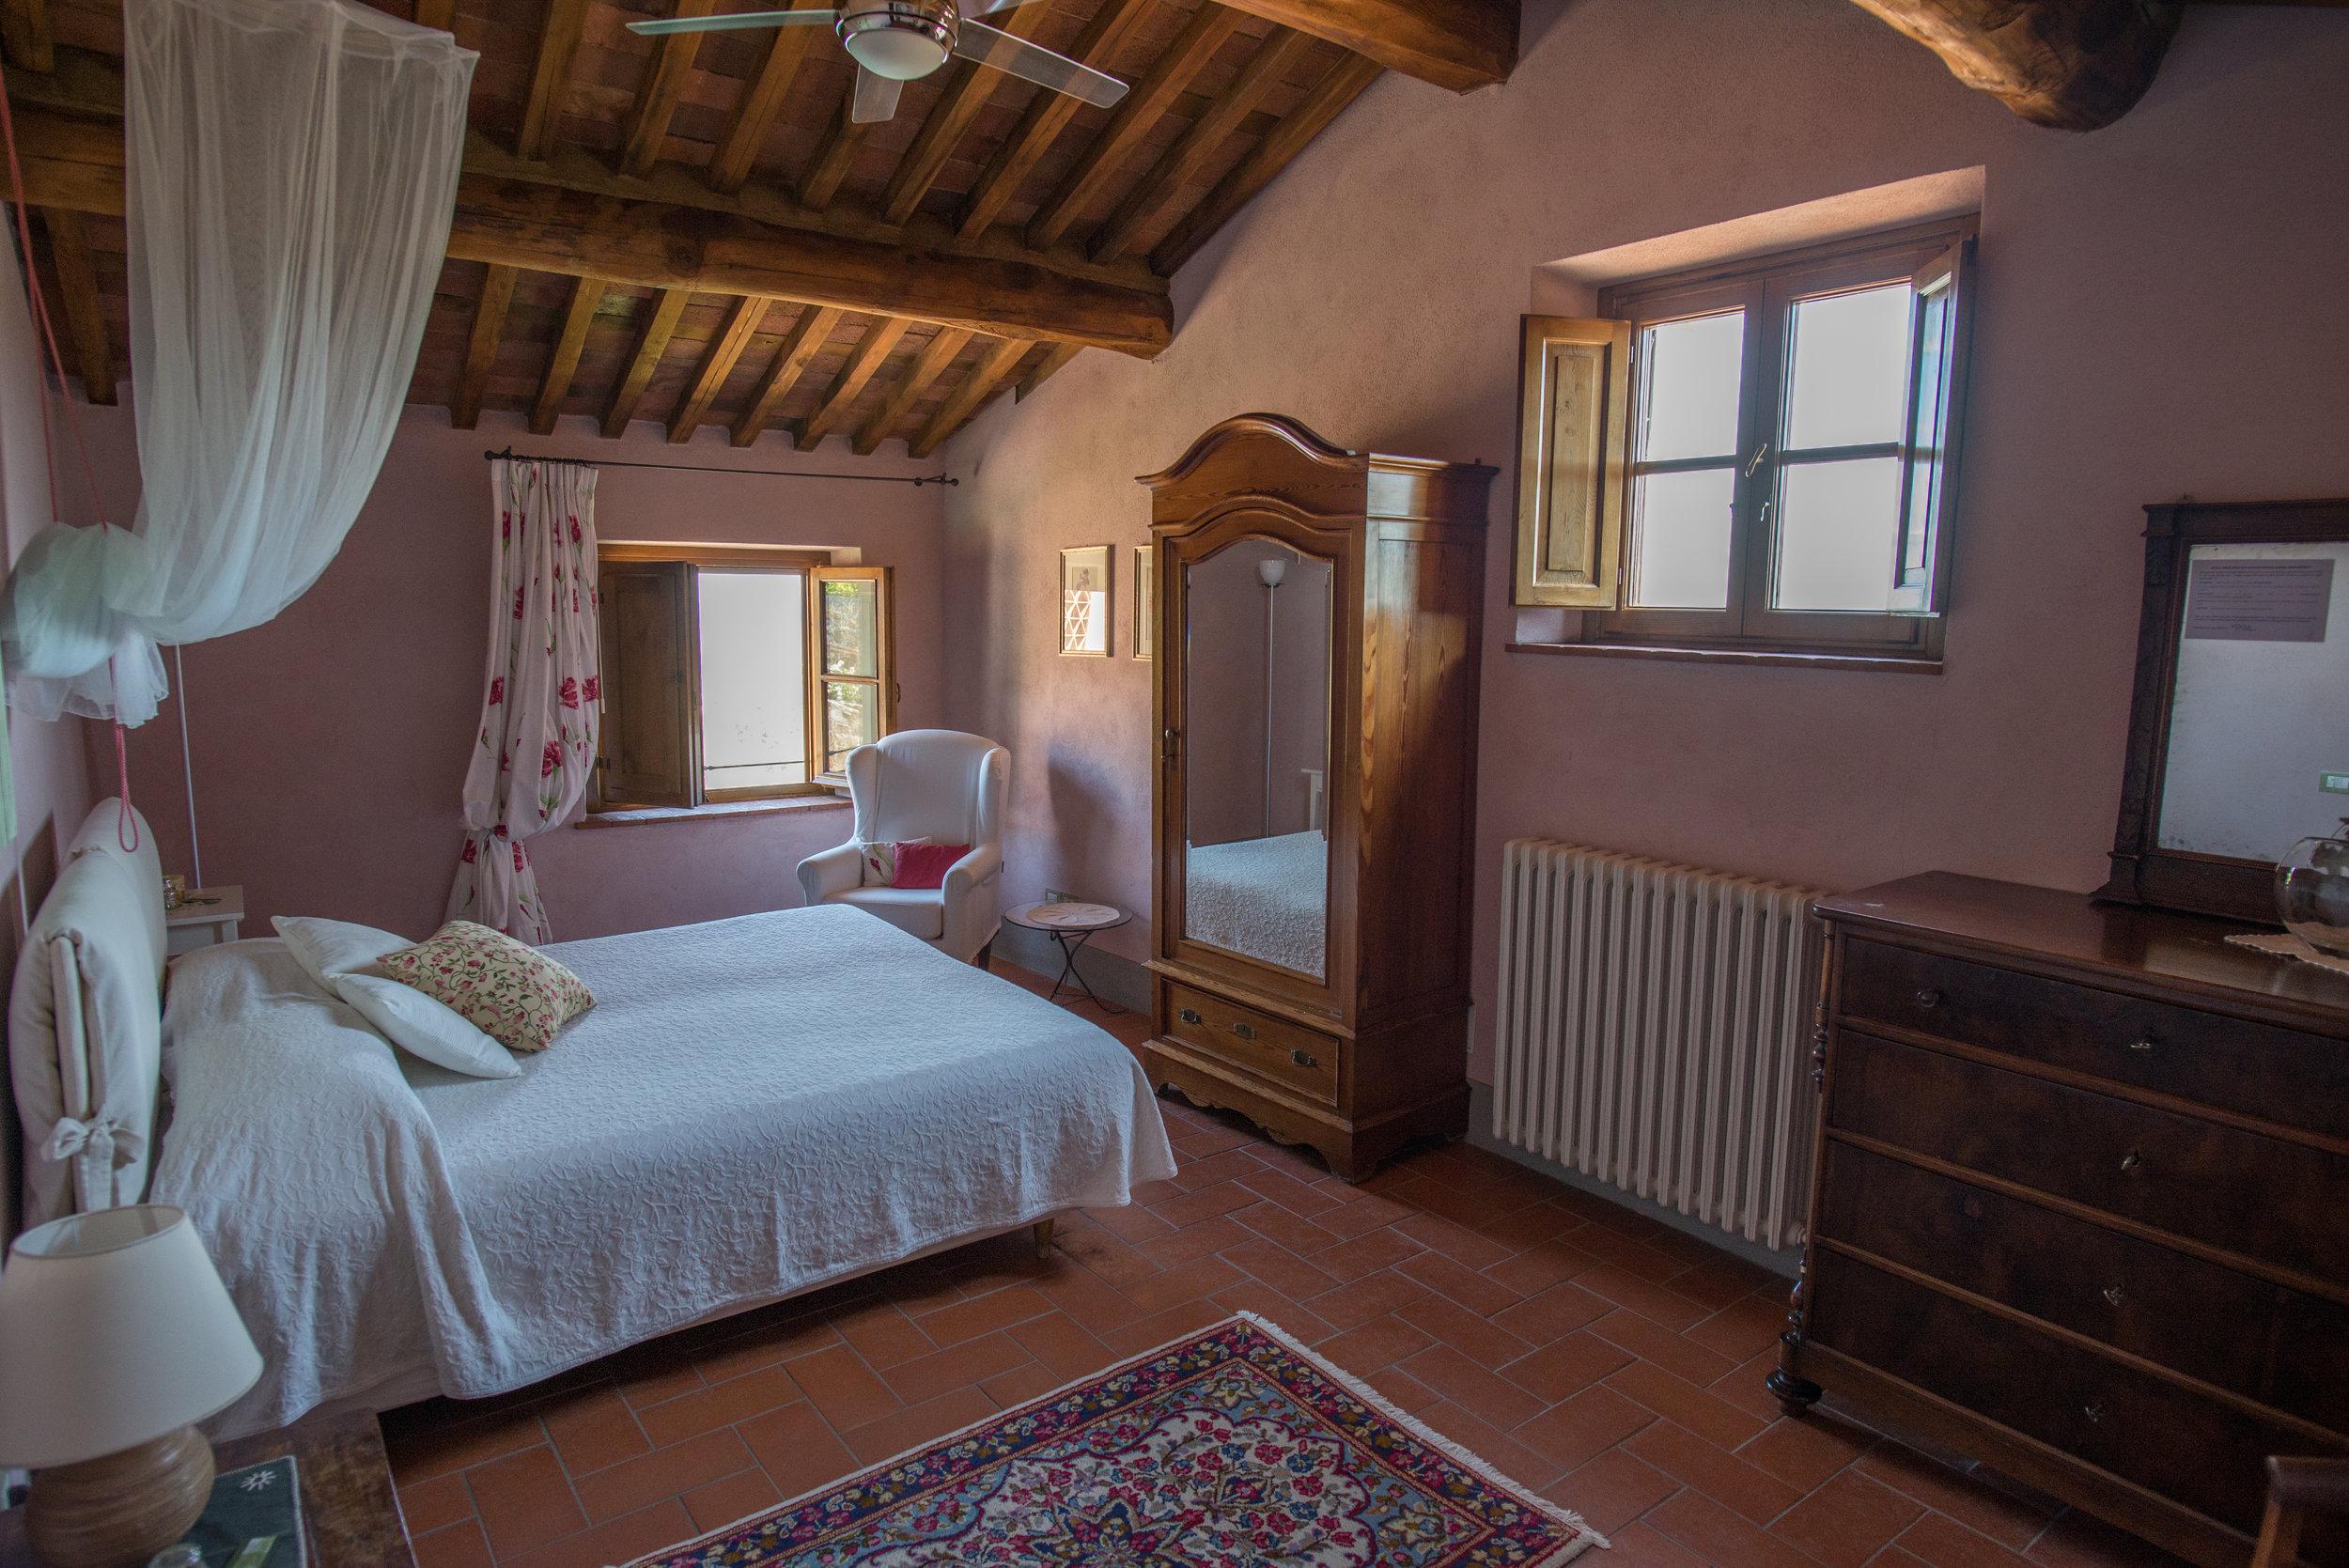 Borghino I Nespoli - Rosa - Twin beds or Double.jpg